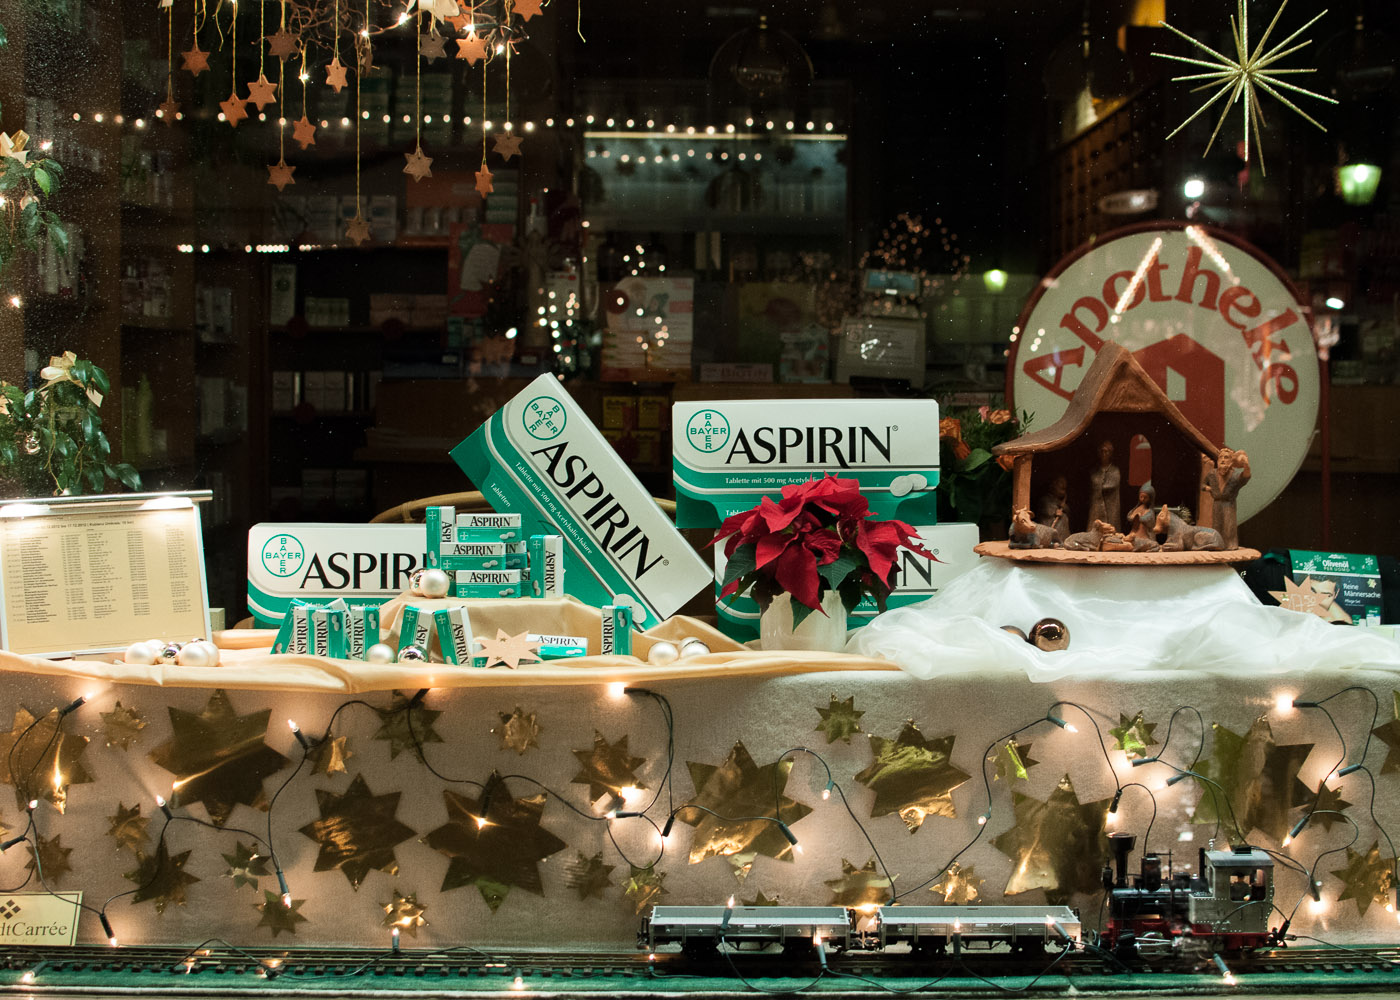 "фото ""Счастливого рождества от Bayer AG"" метки: путешествия, город, аптека, аспирин, витрина, рождество"